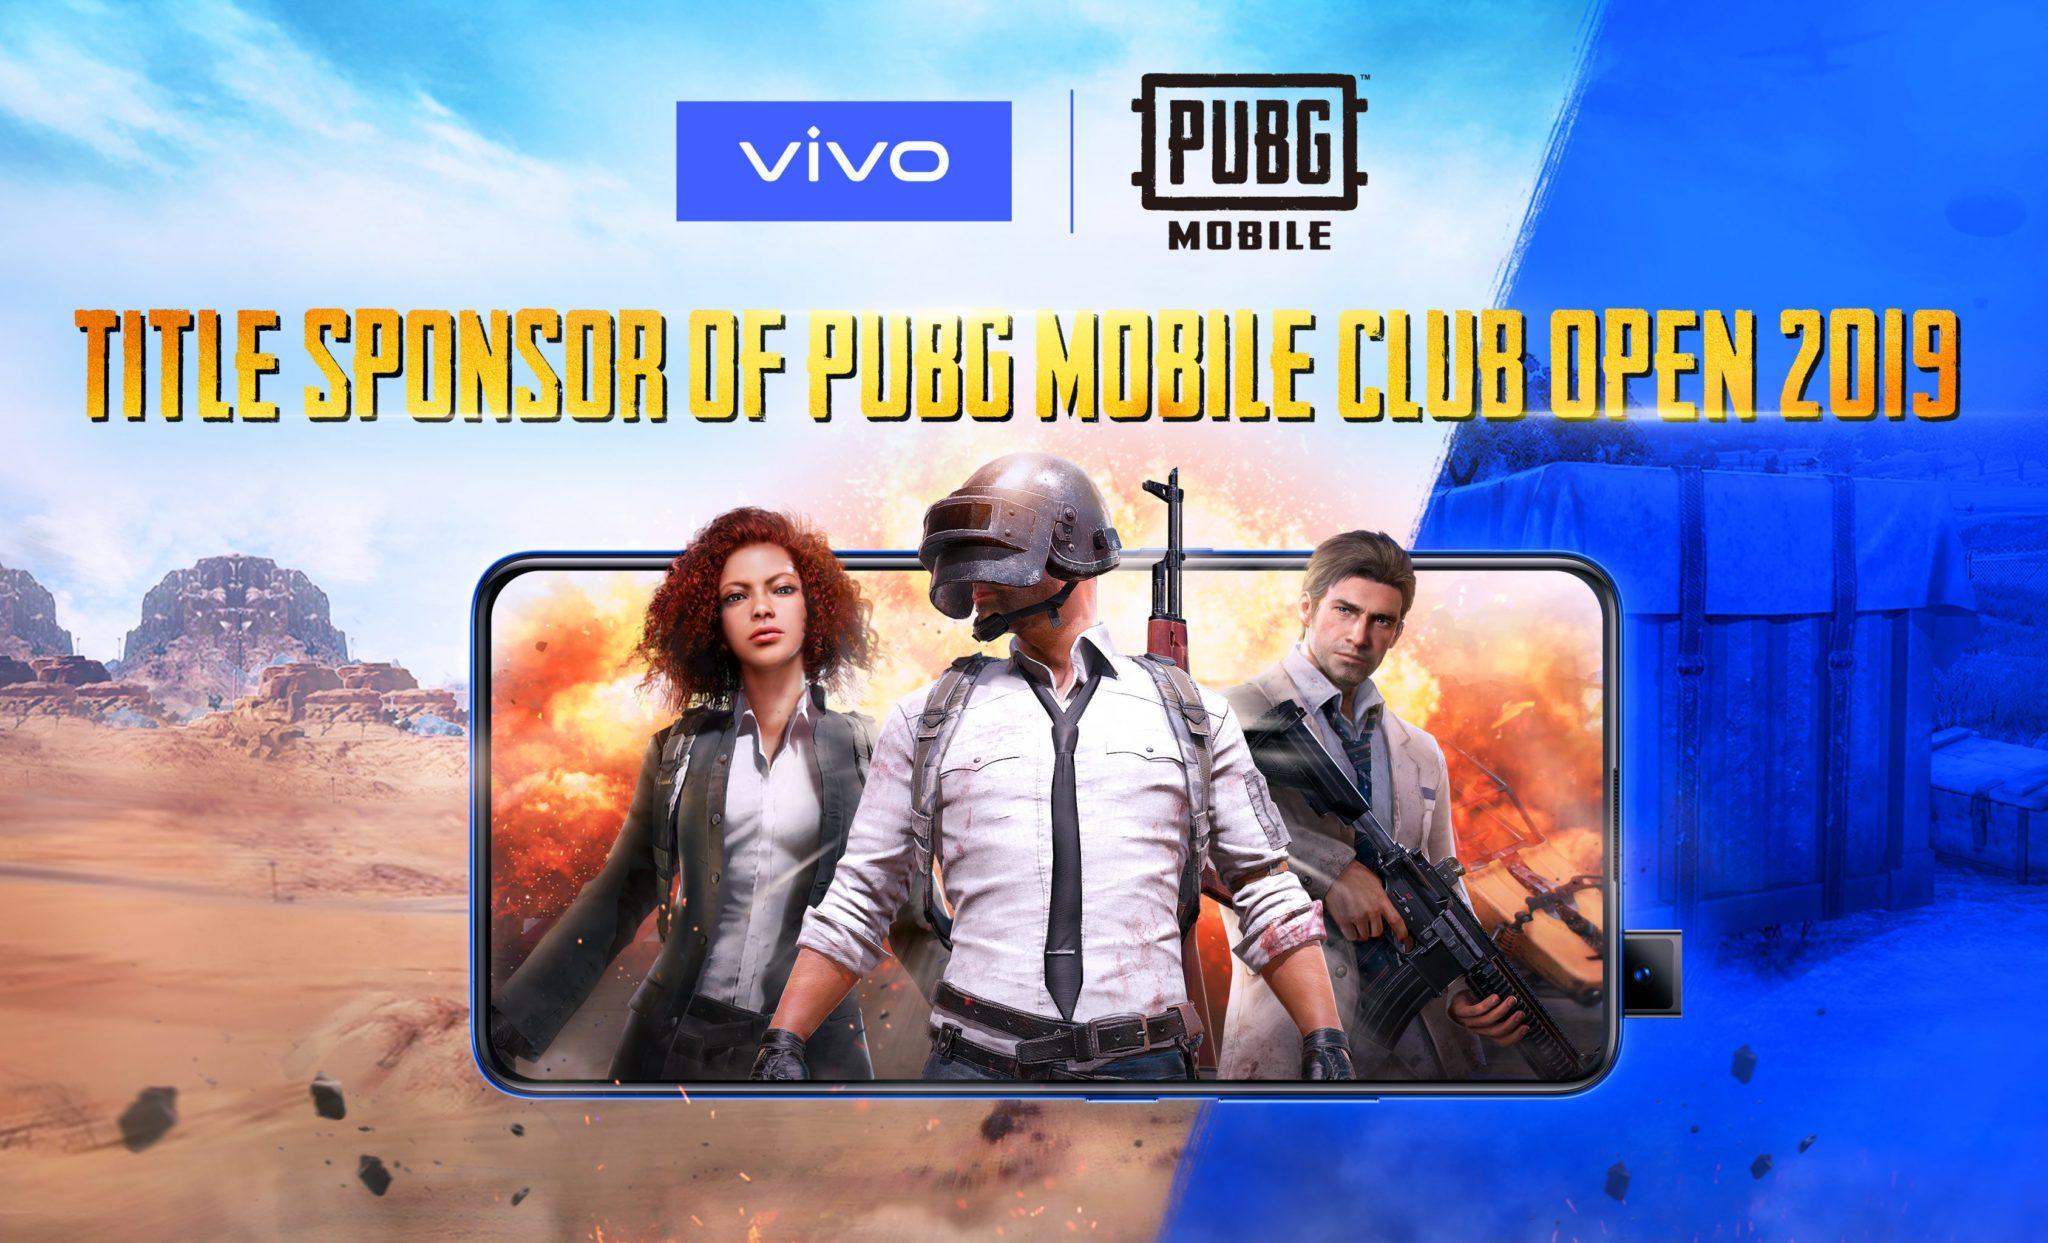 Vivo ยกระดับประสบการณ์เกมเมอร์ในการแข่งขัน PUBG MOBILE Club Open 2019 13 -